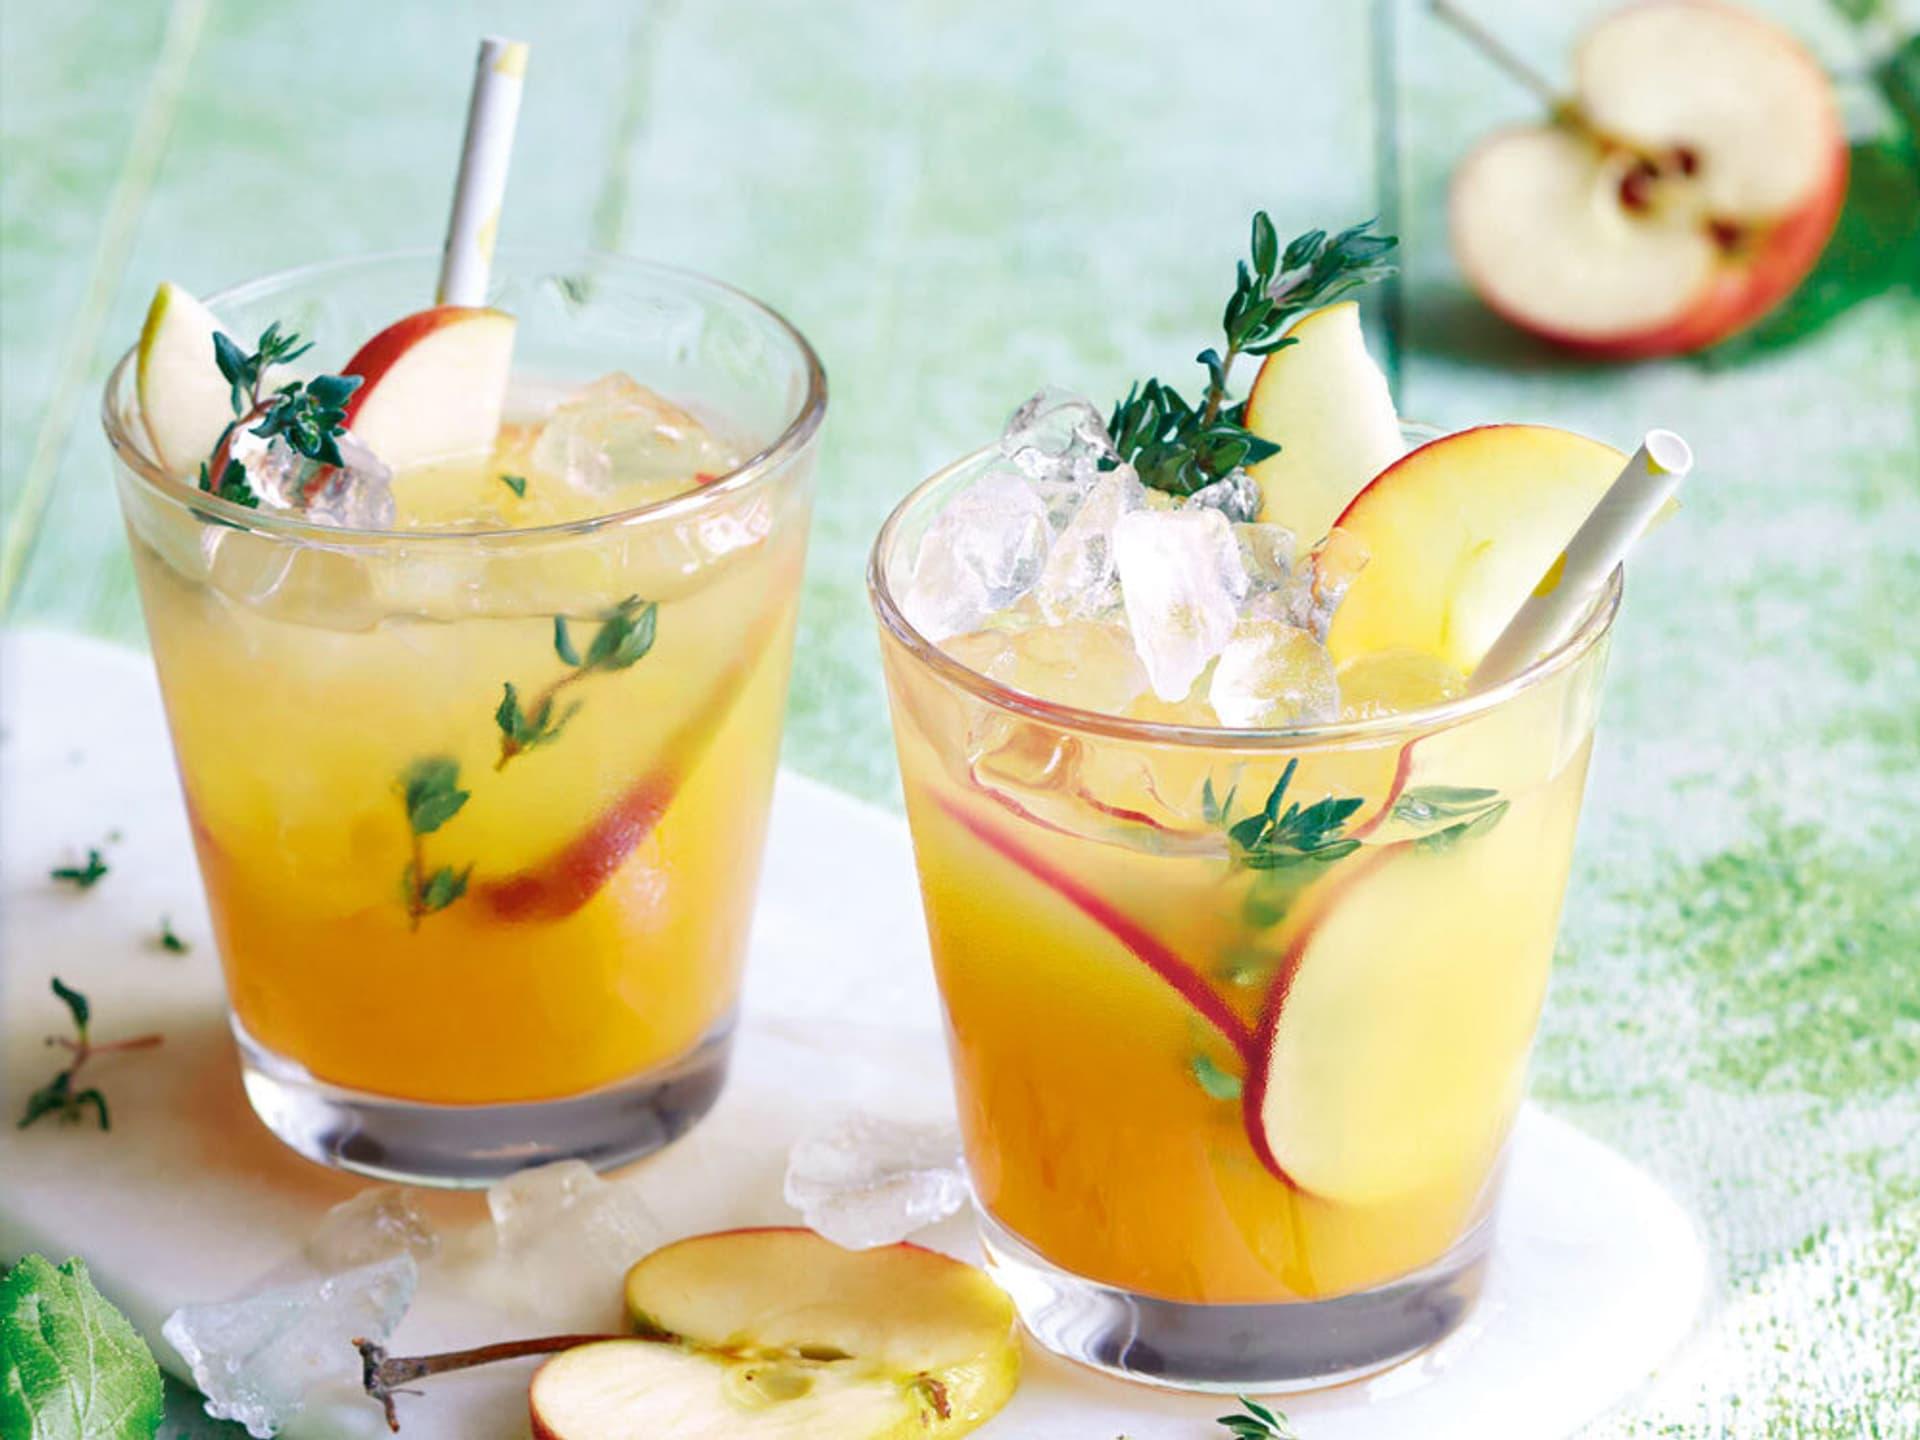 Apfel-Sanddorn-Spritz